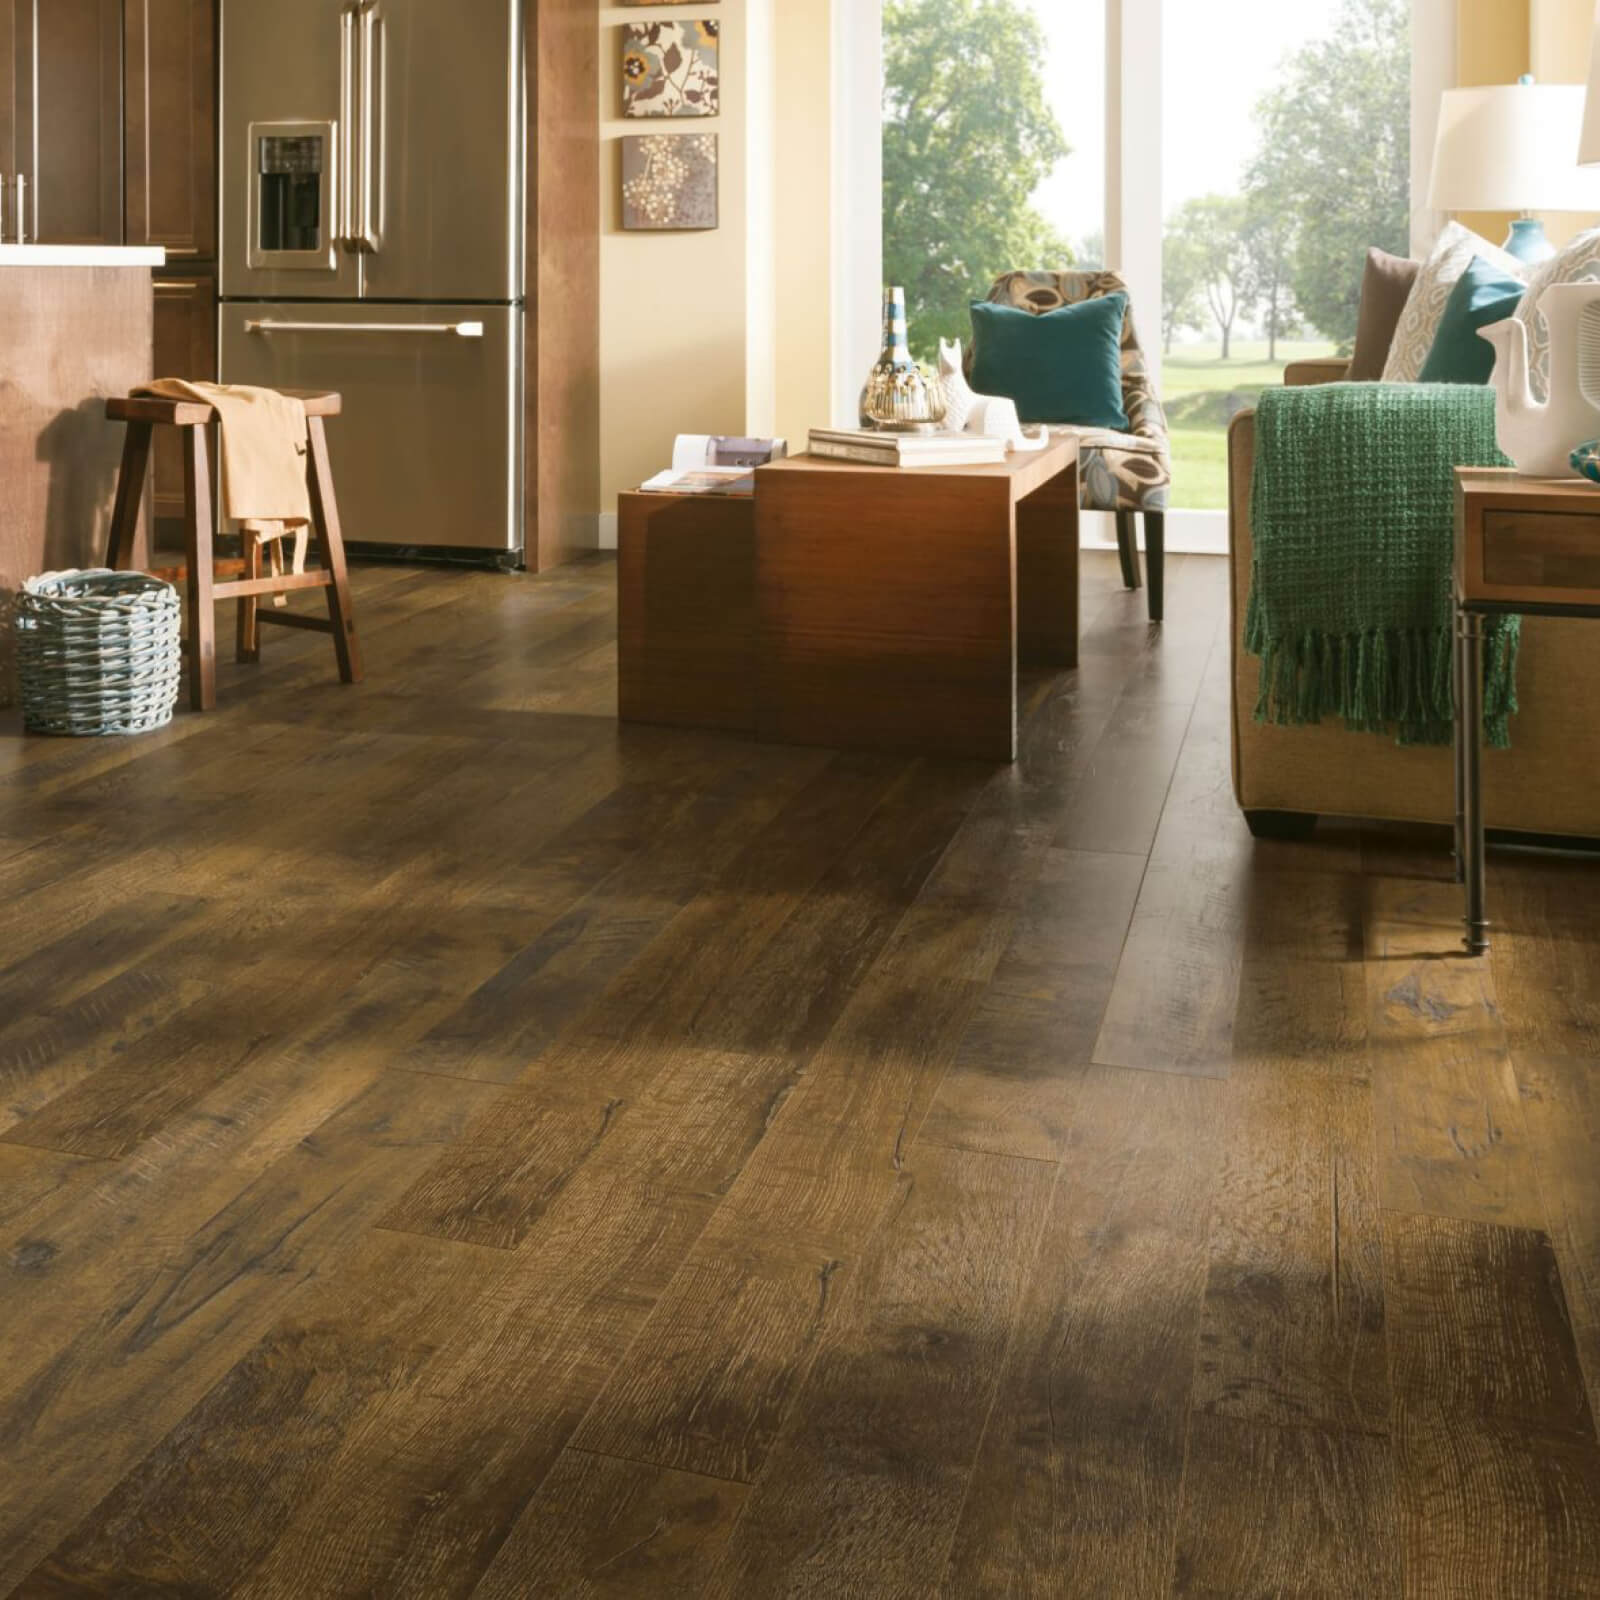 Amendoim Luxury Vinyl Tile | Carpets And More, Inc